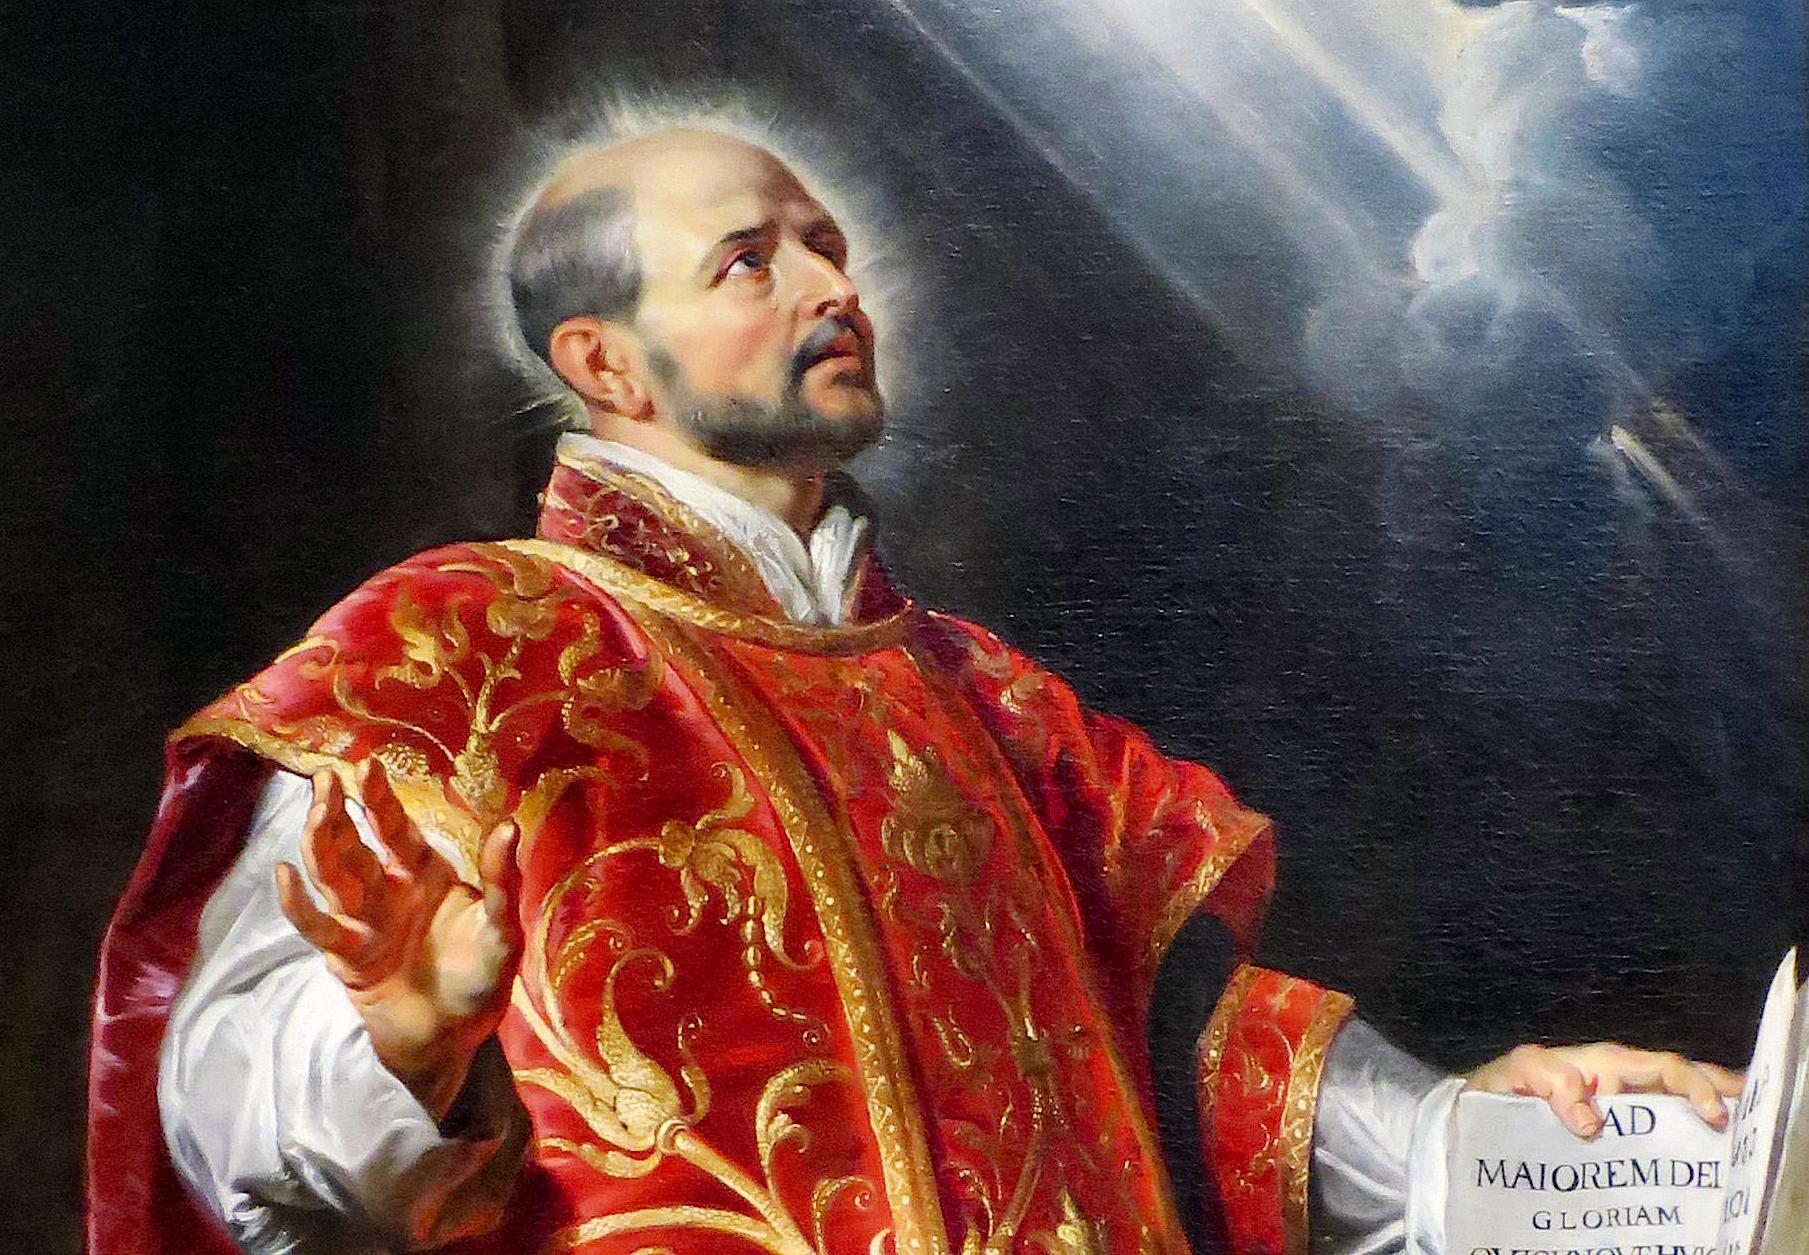 Saint Ignace de Loyola (1491-1556) / WIKIMEDIA COMMONS - Peter Paul Rubens